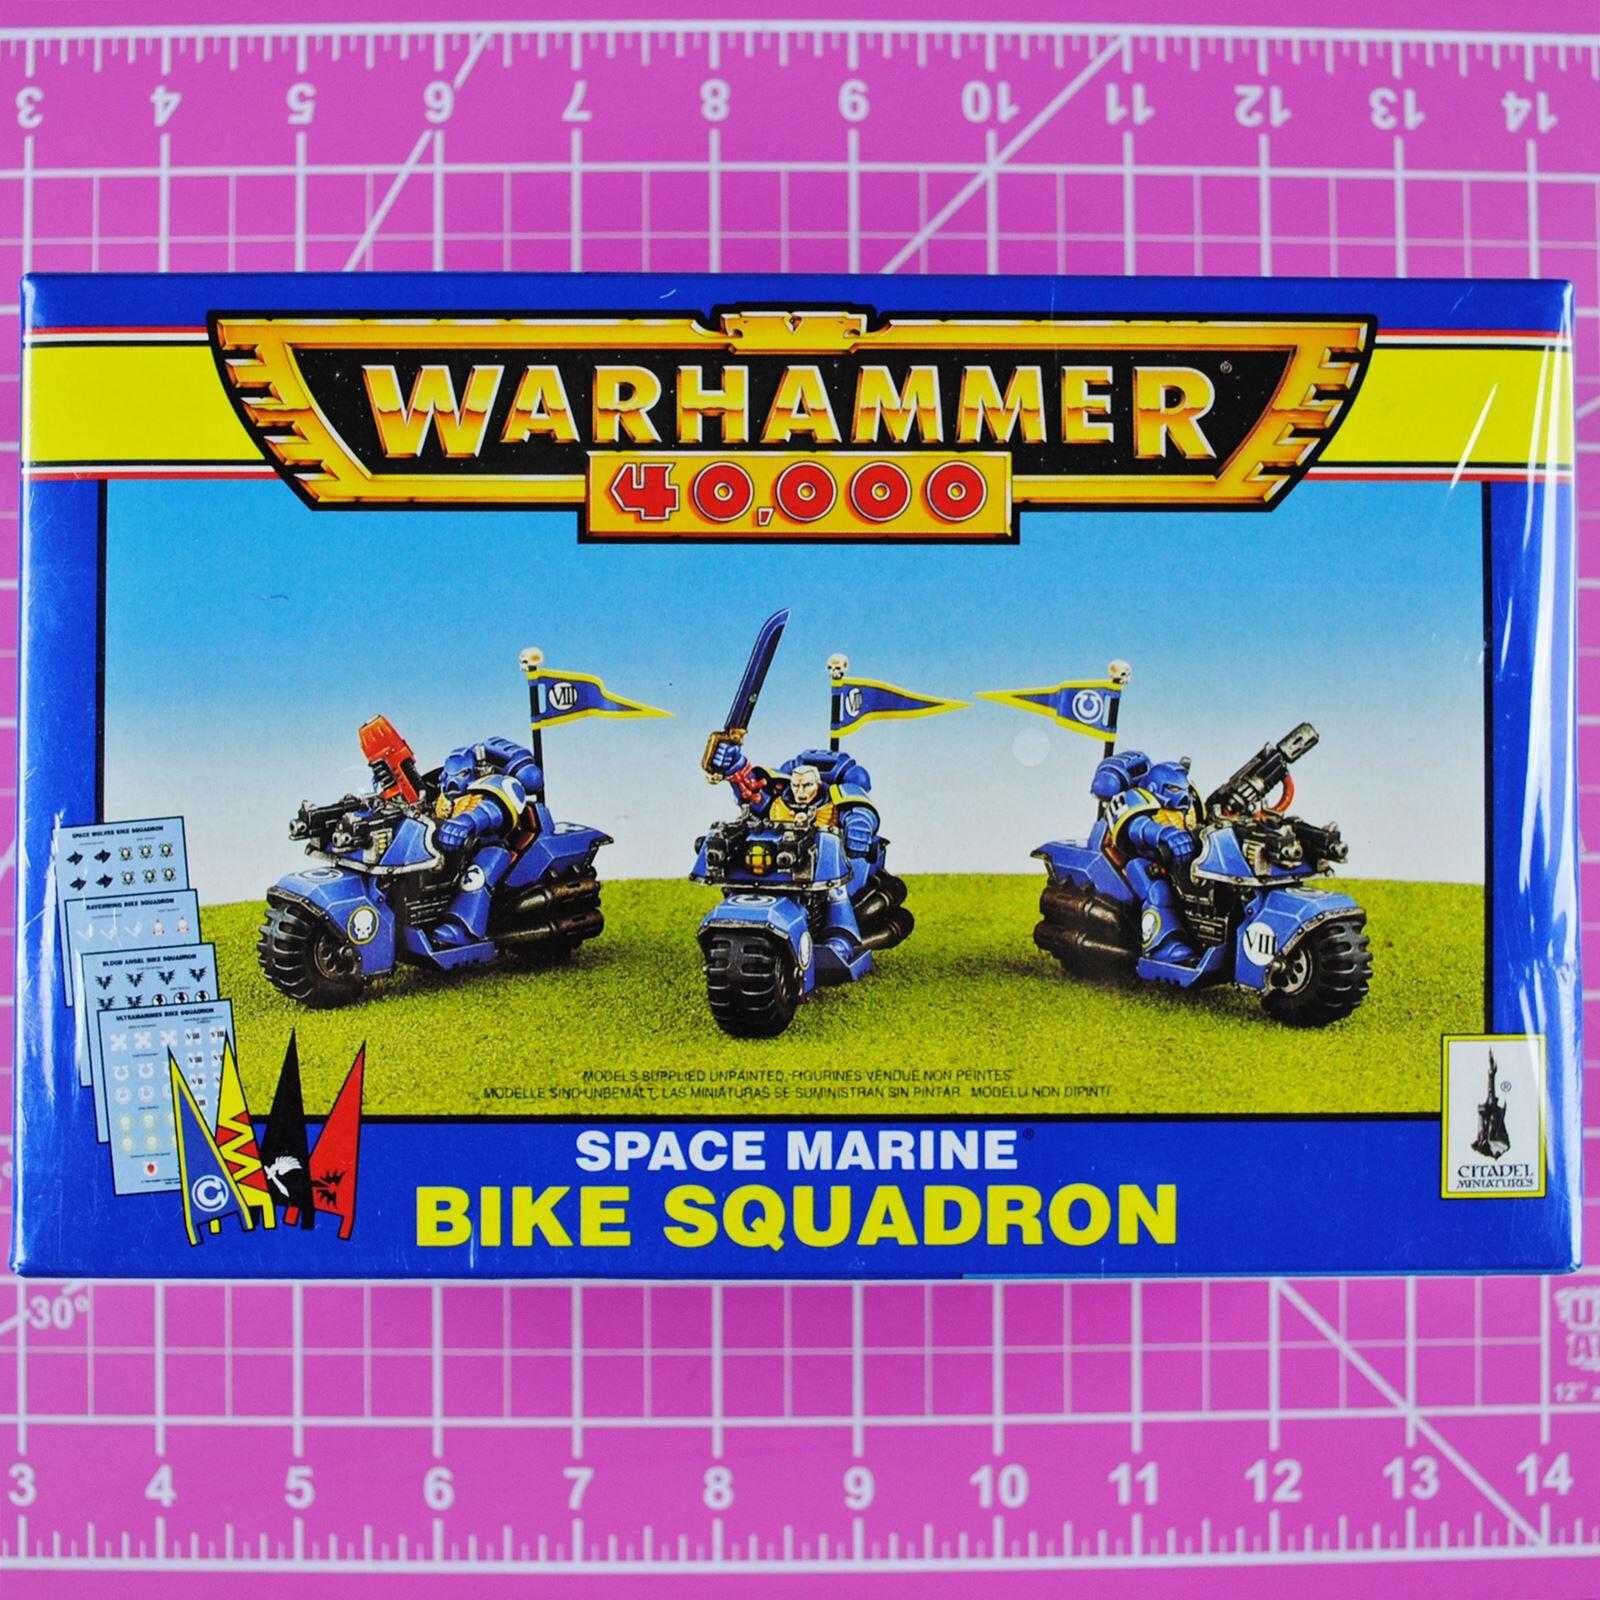 Warhammer 40k space marine motorrad - staffel (metall und kunststoff) - - klassiker